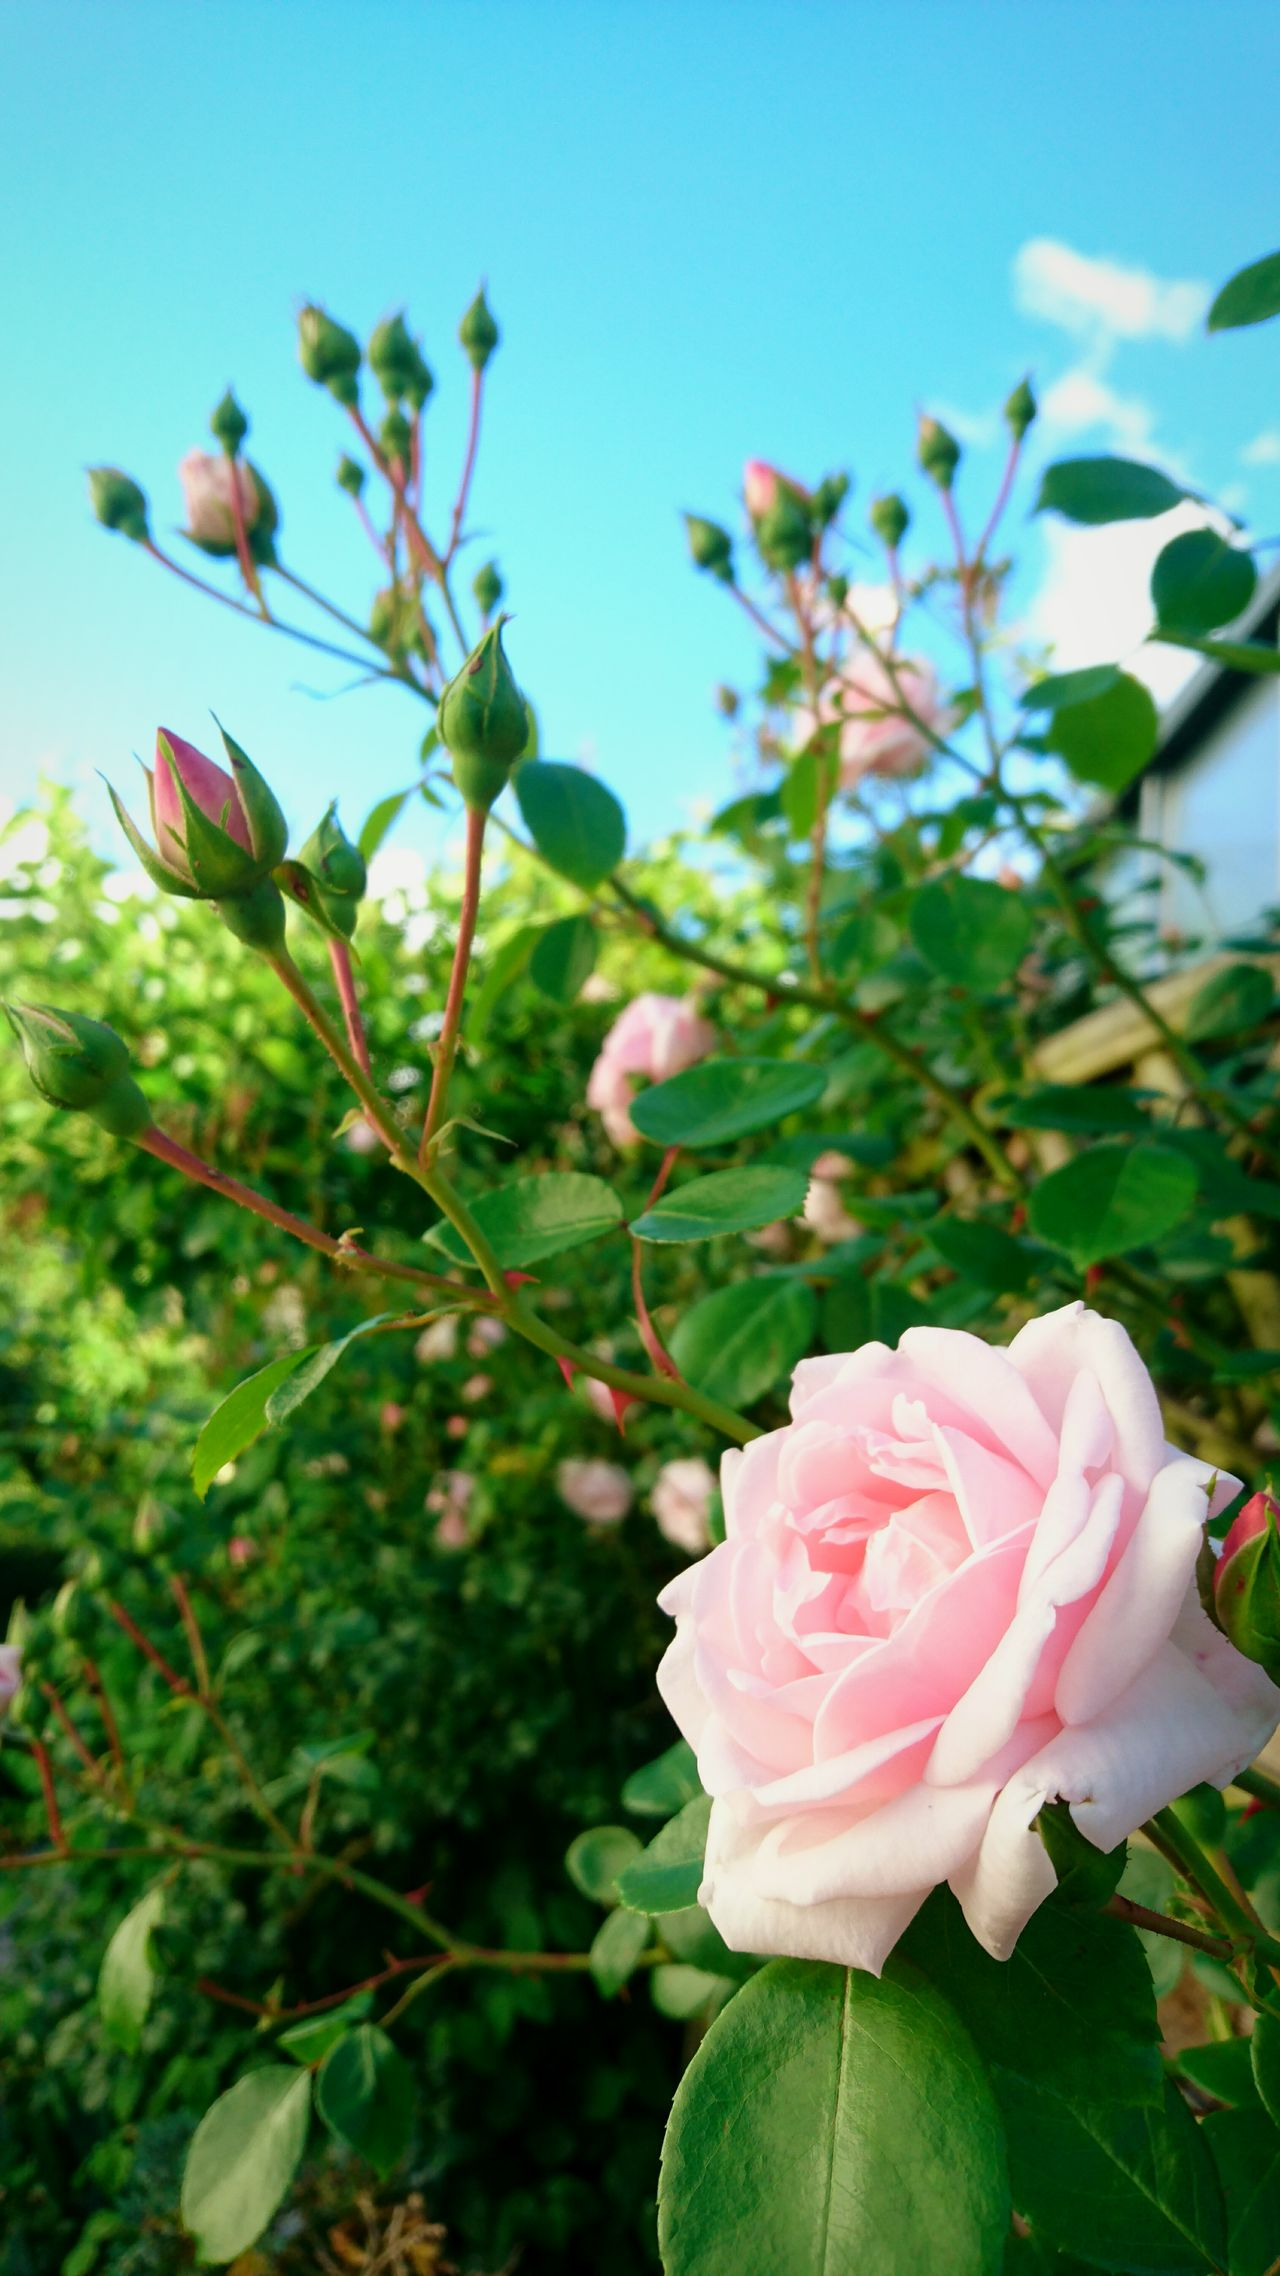 Roses Roses Flowers  Roses🌹 Nature Nature Photography EyeEm Nature Lover EyeEm Best Shots - Nature EyeEm Flower Eyeem Collection Taking Photos Check This Out Macro Flowers EyeEm Best Shots - Flowers Flowers, Nature And Beauty Eyeem PhotographyTaking Photos